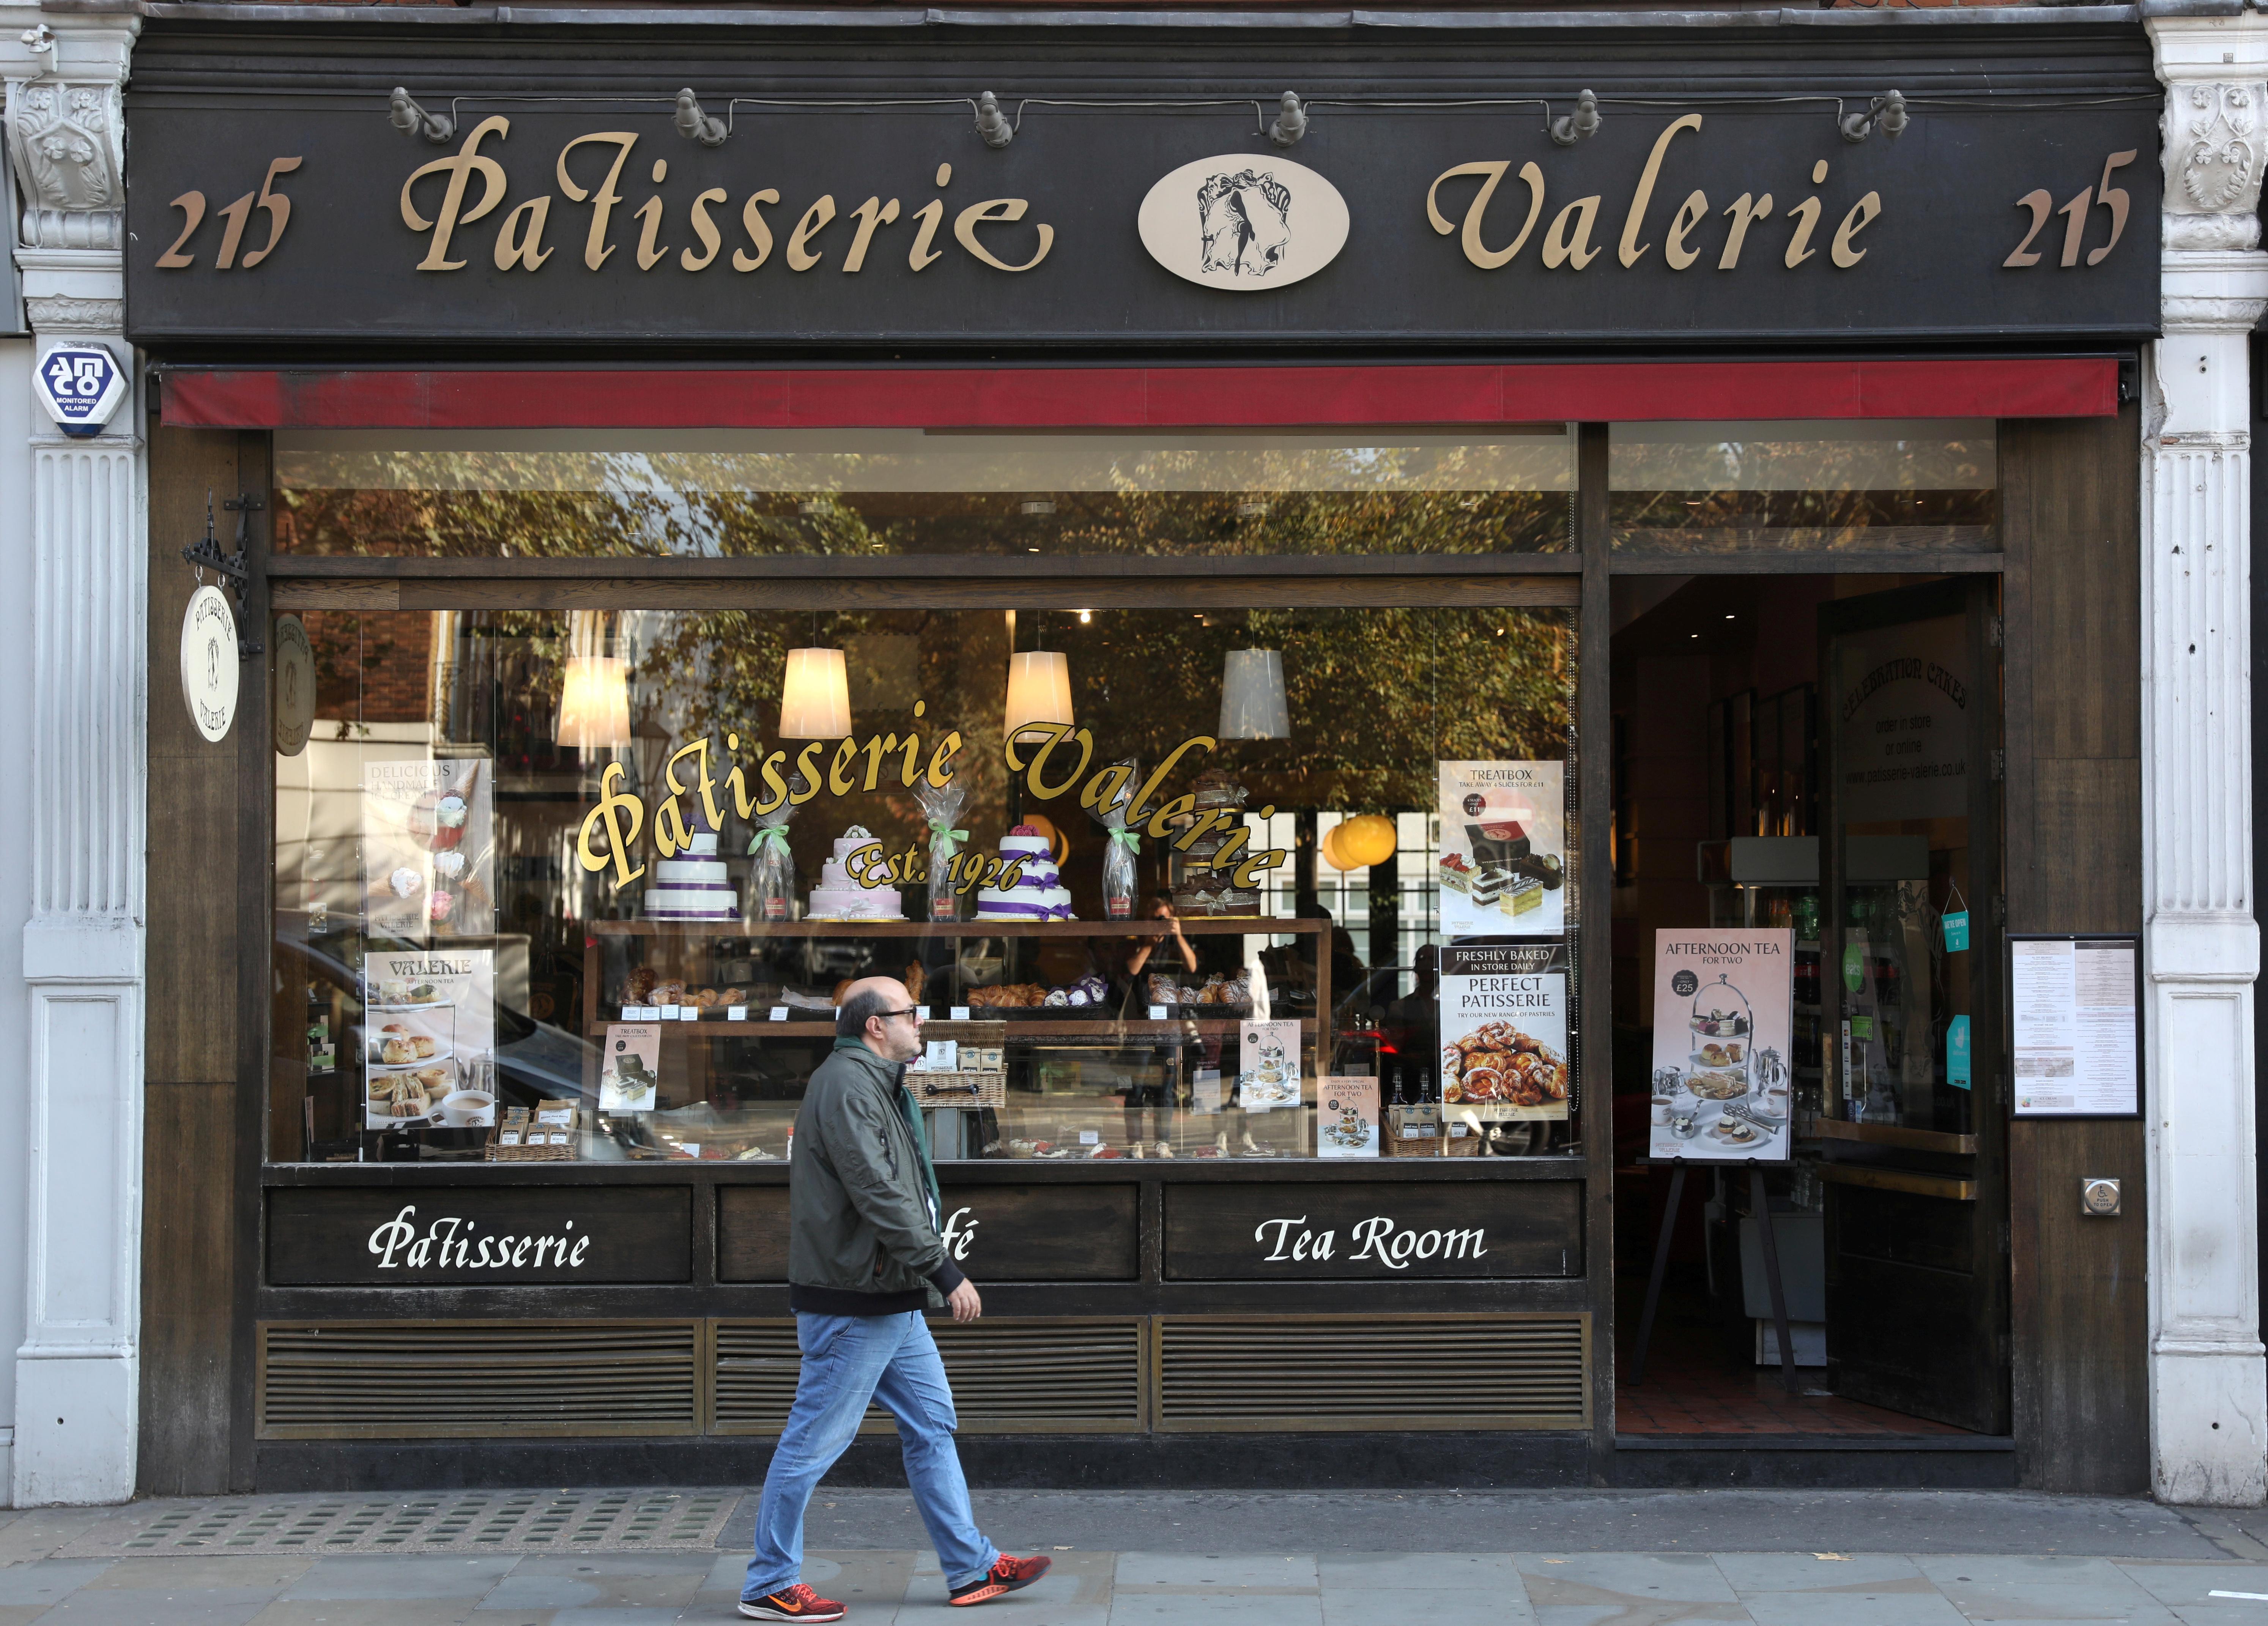 Five arrested in investigation into Patisserie Valerie